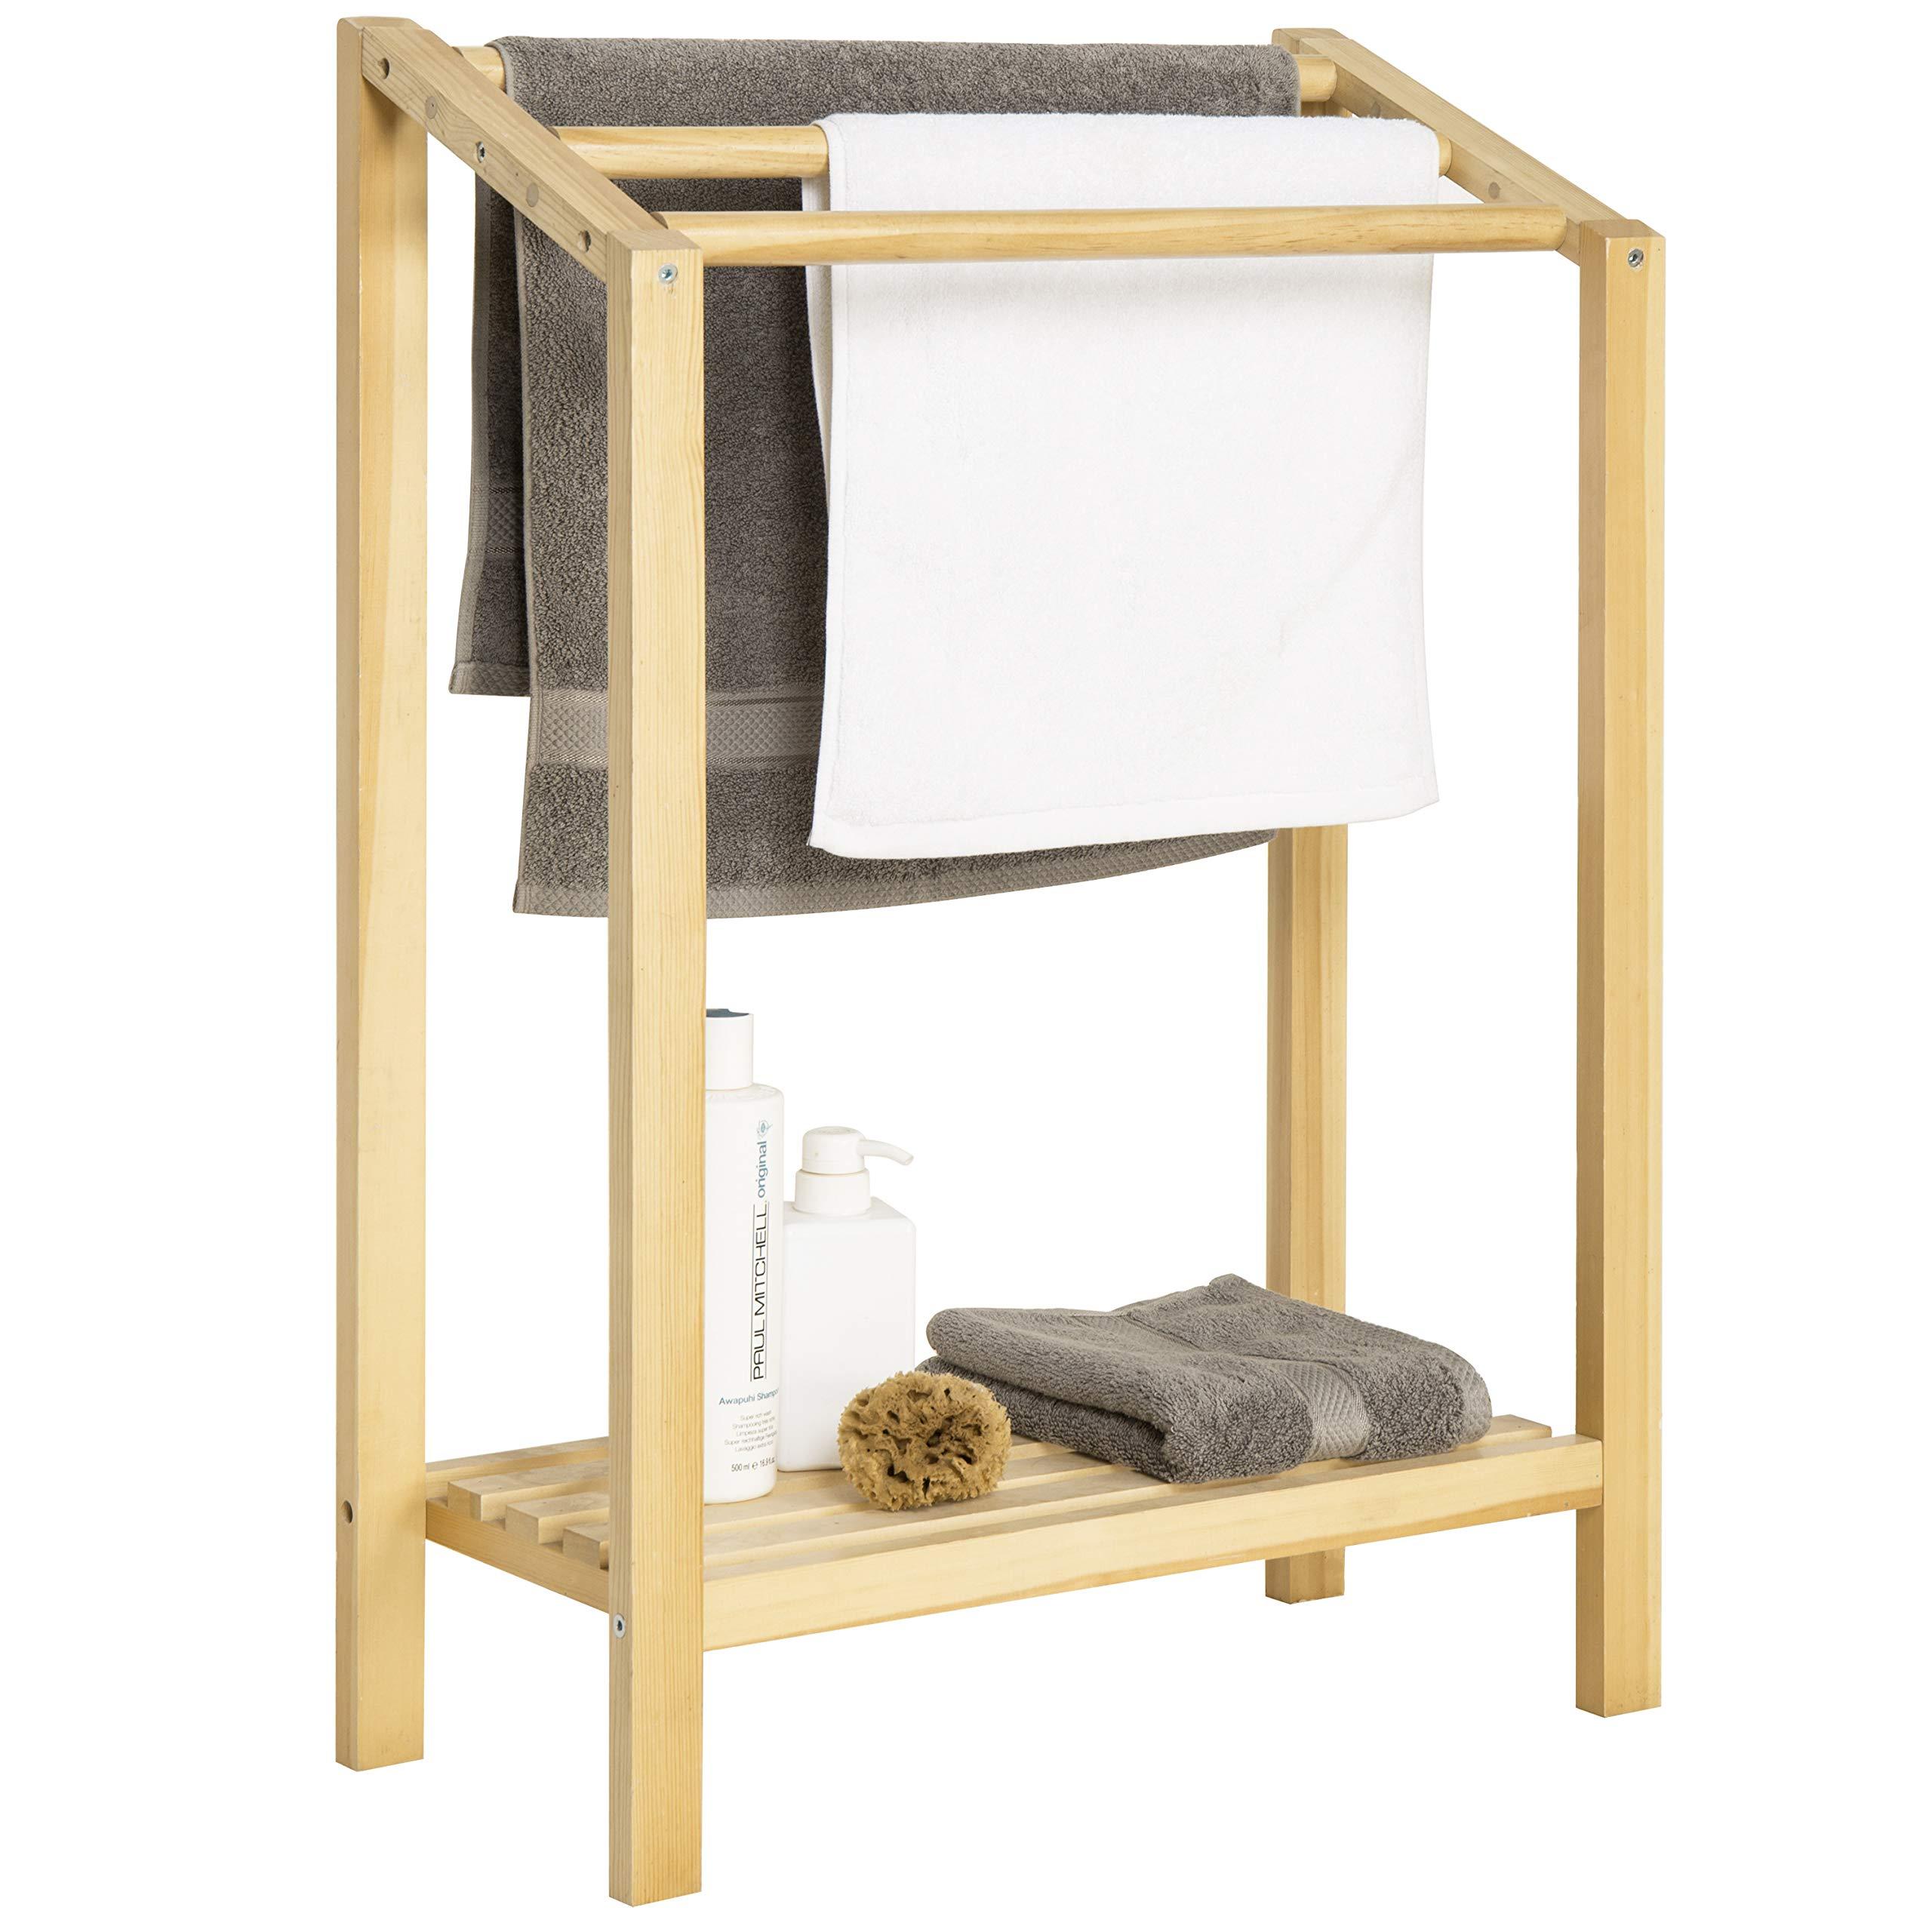 MyGift 3-Bar Freestanding Natural Wood Bathroom Towel Rack with Bottom Shelf